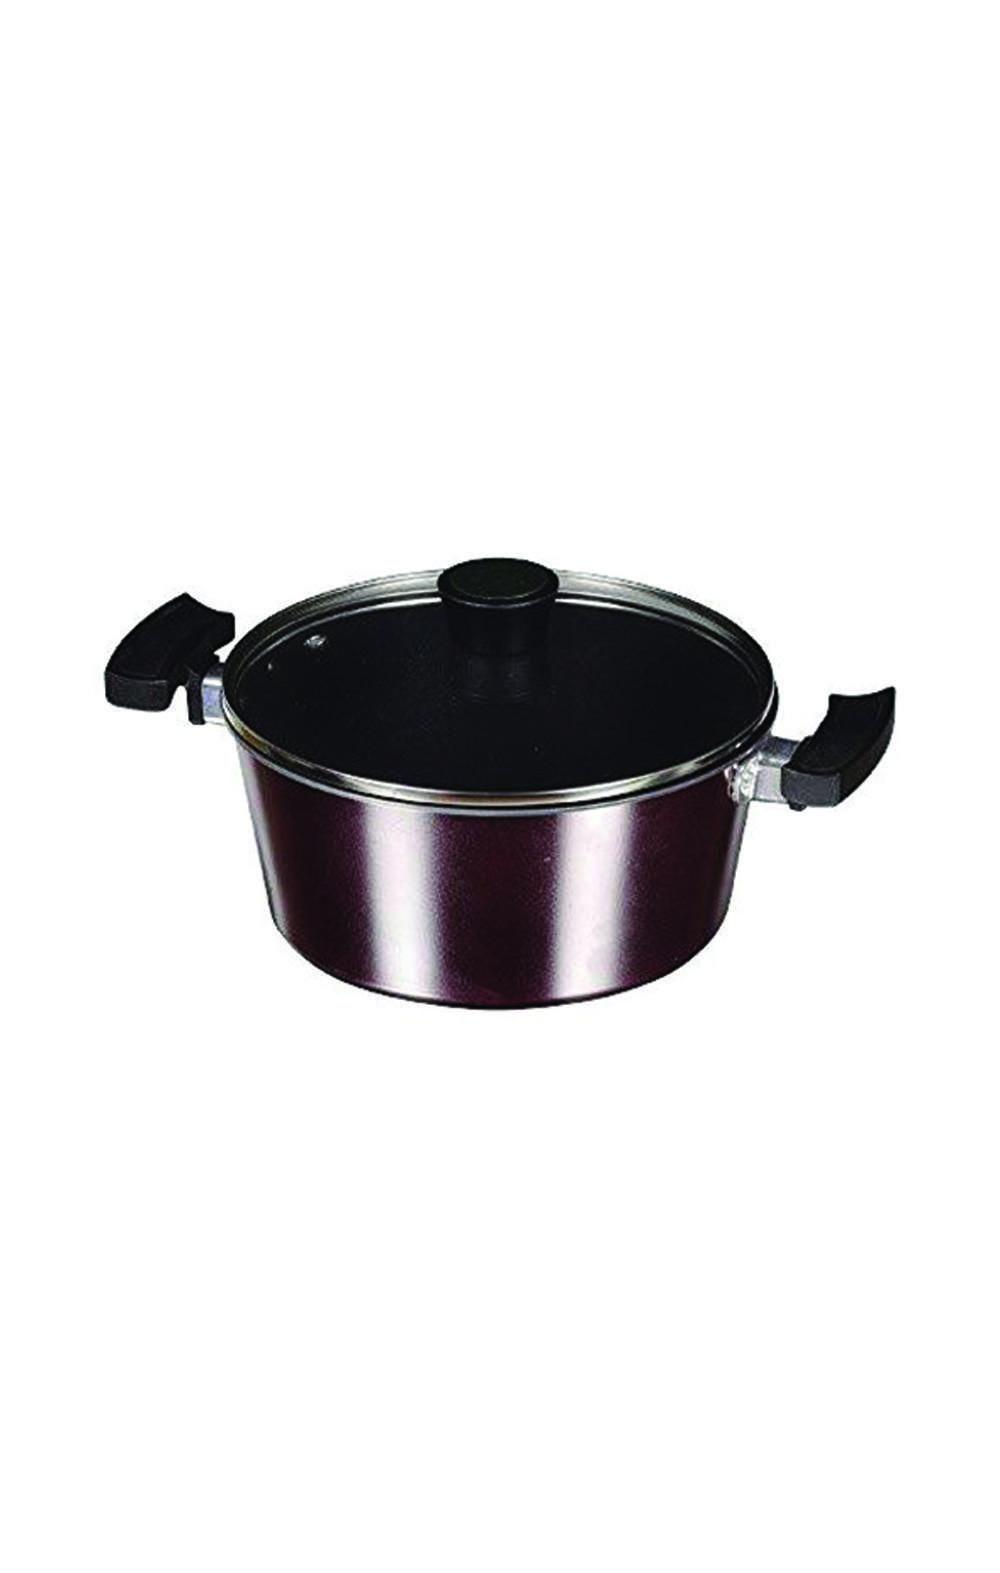 Pearl MetalHB-1236 Two-handed pan 22cm glass pan  قدر مع غطاء بايركس